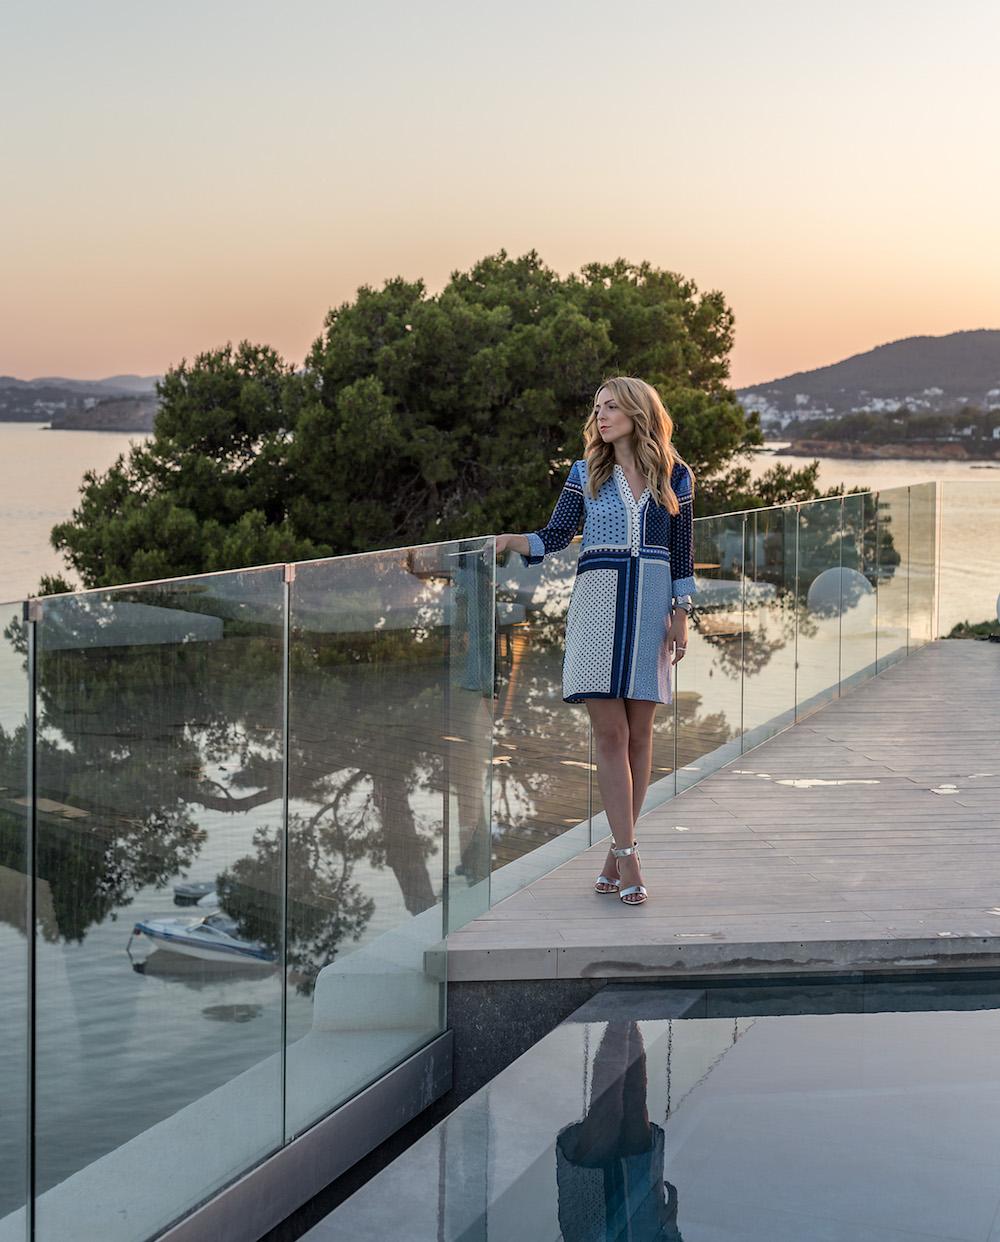 Me Ibiza Review